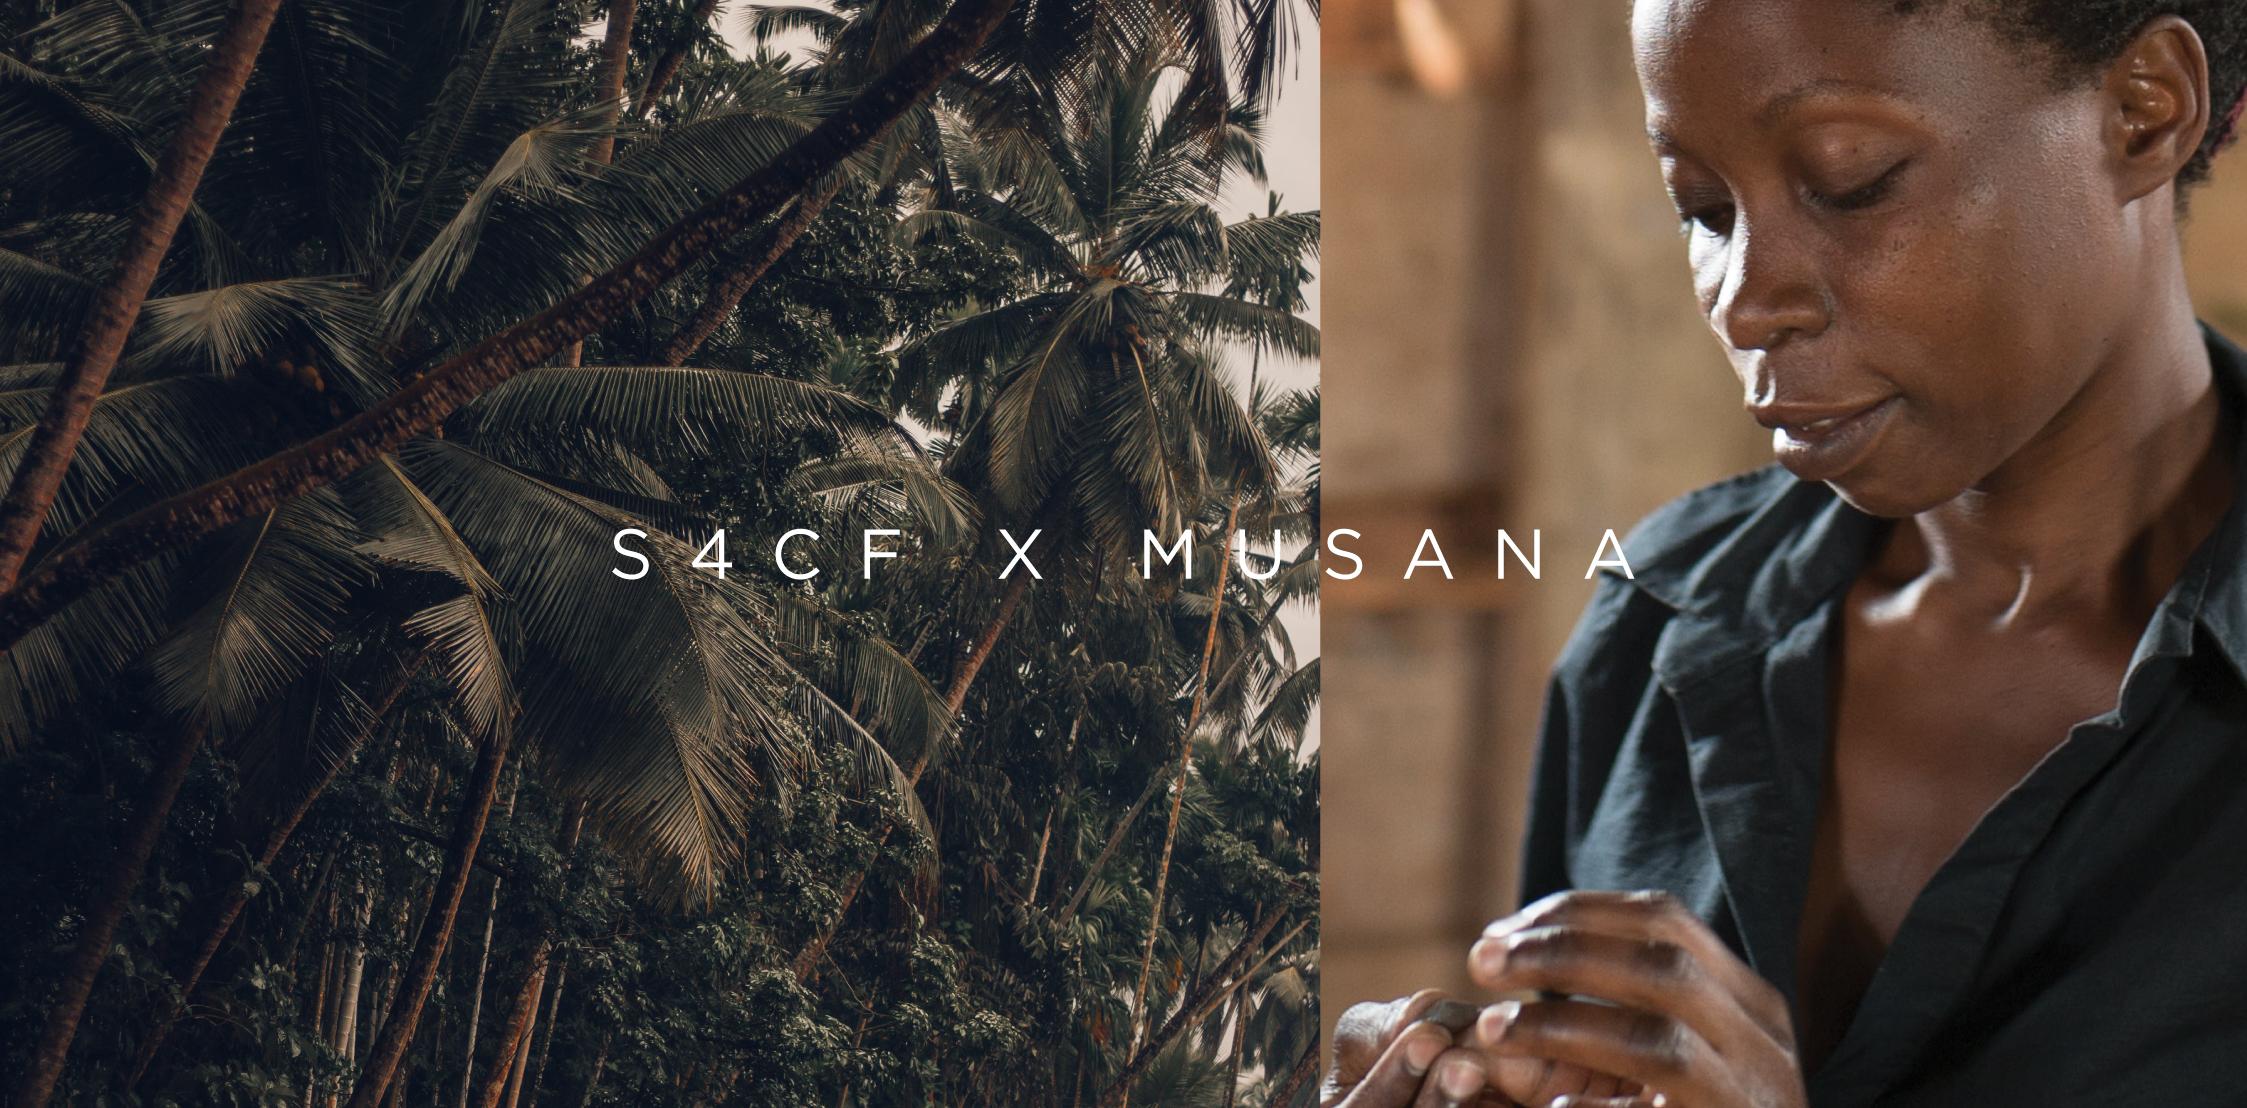 MUSANA-BANNER.jpg